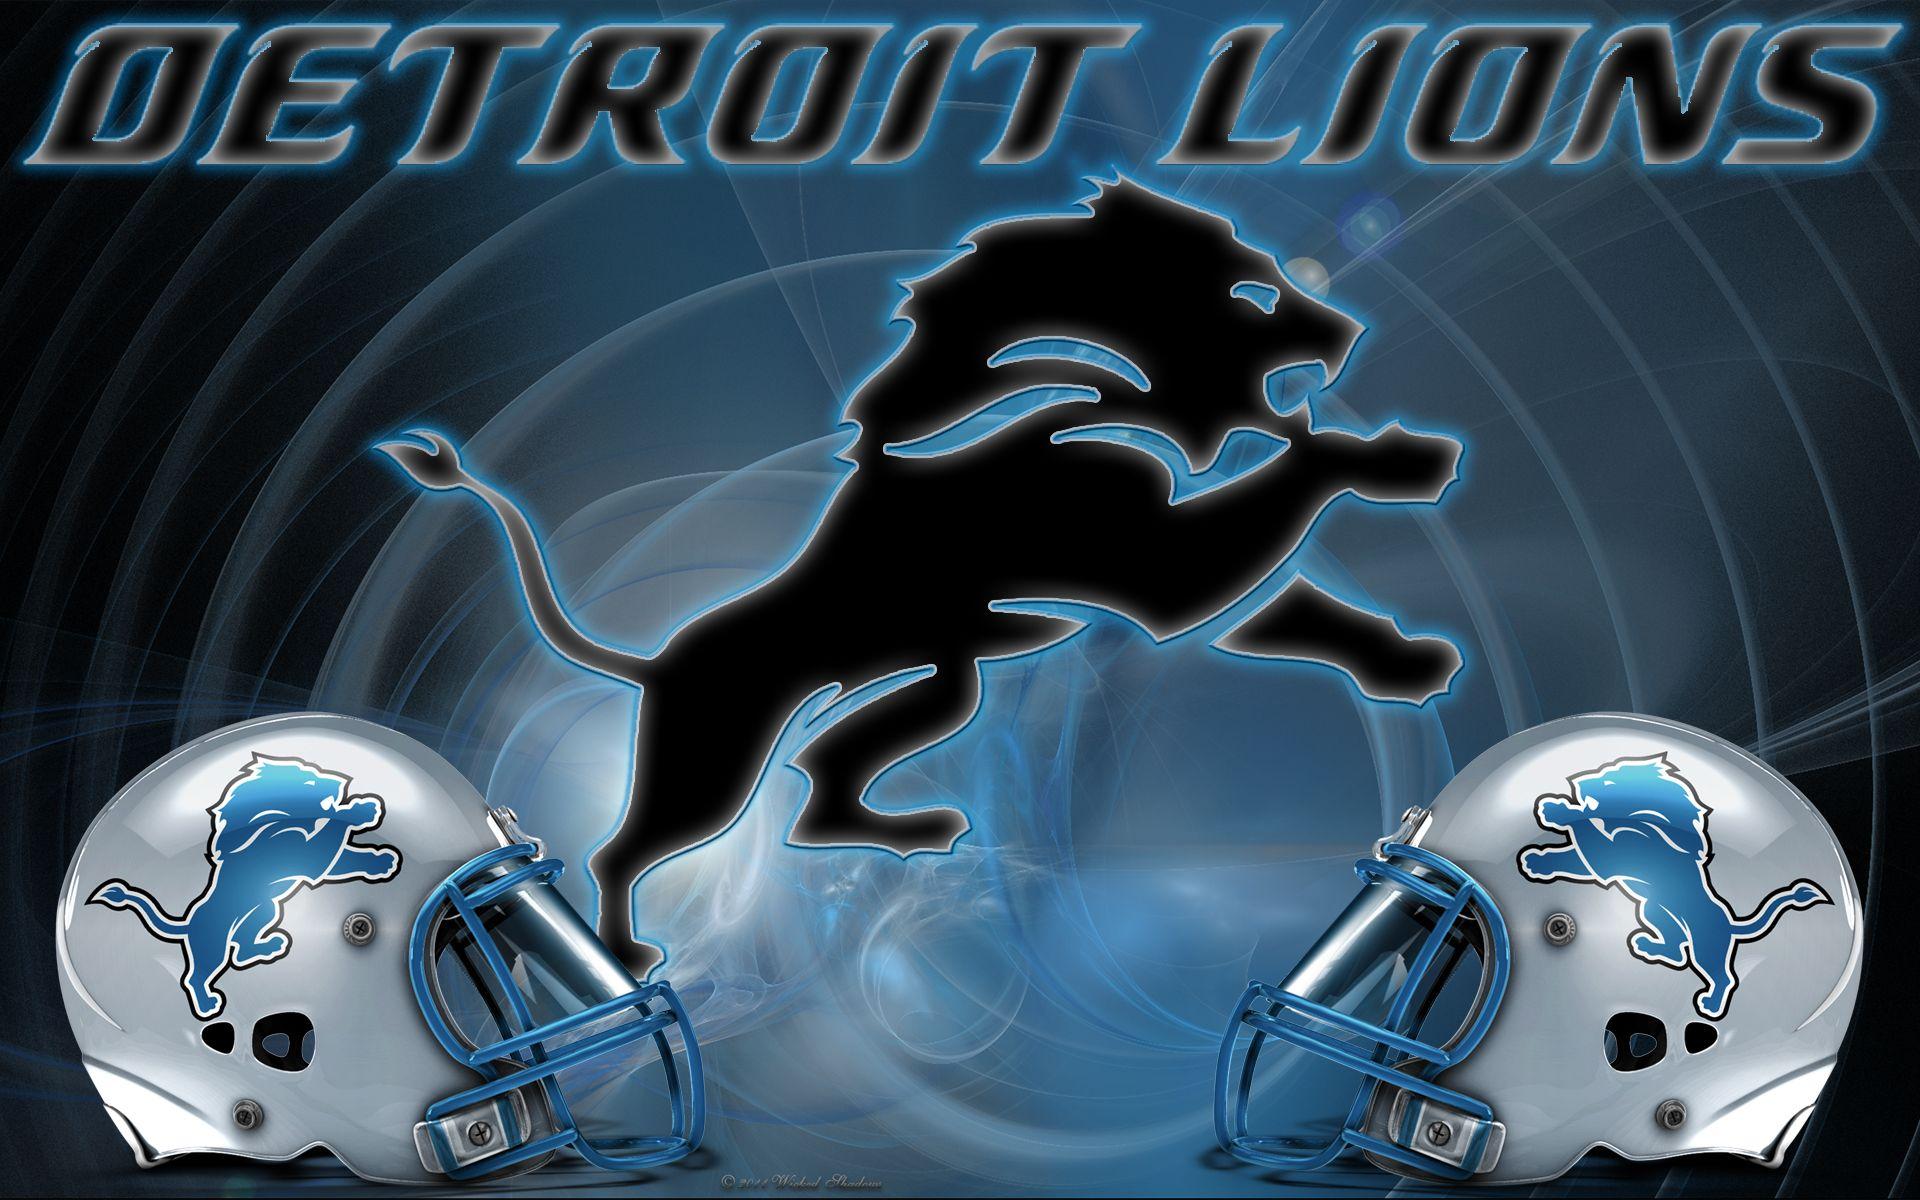 Detroit Lions Wallpapers (With images) Detroit lions